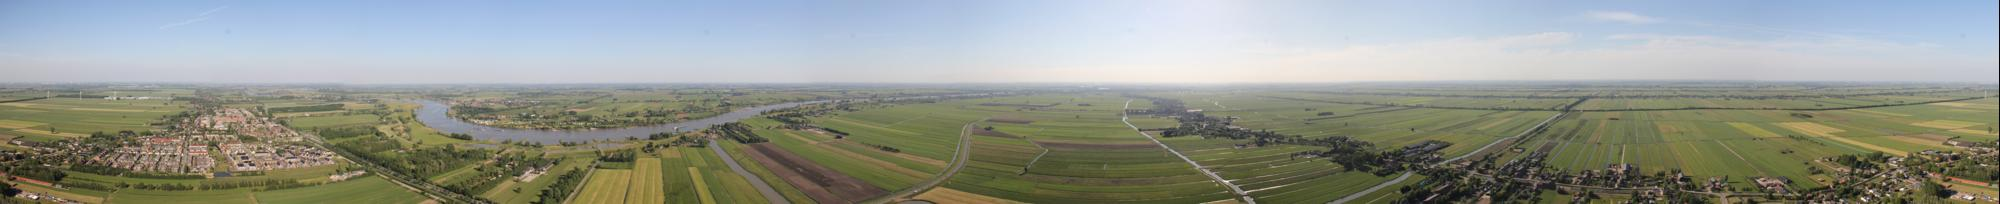 360 degree Cabauw panorama